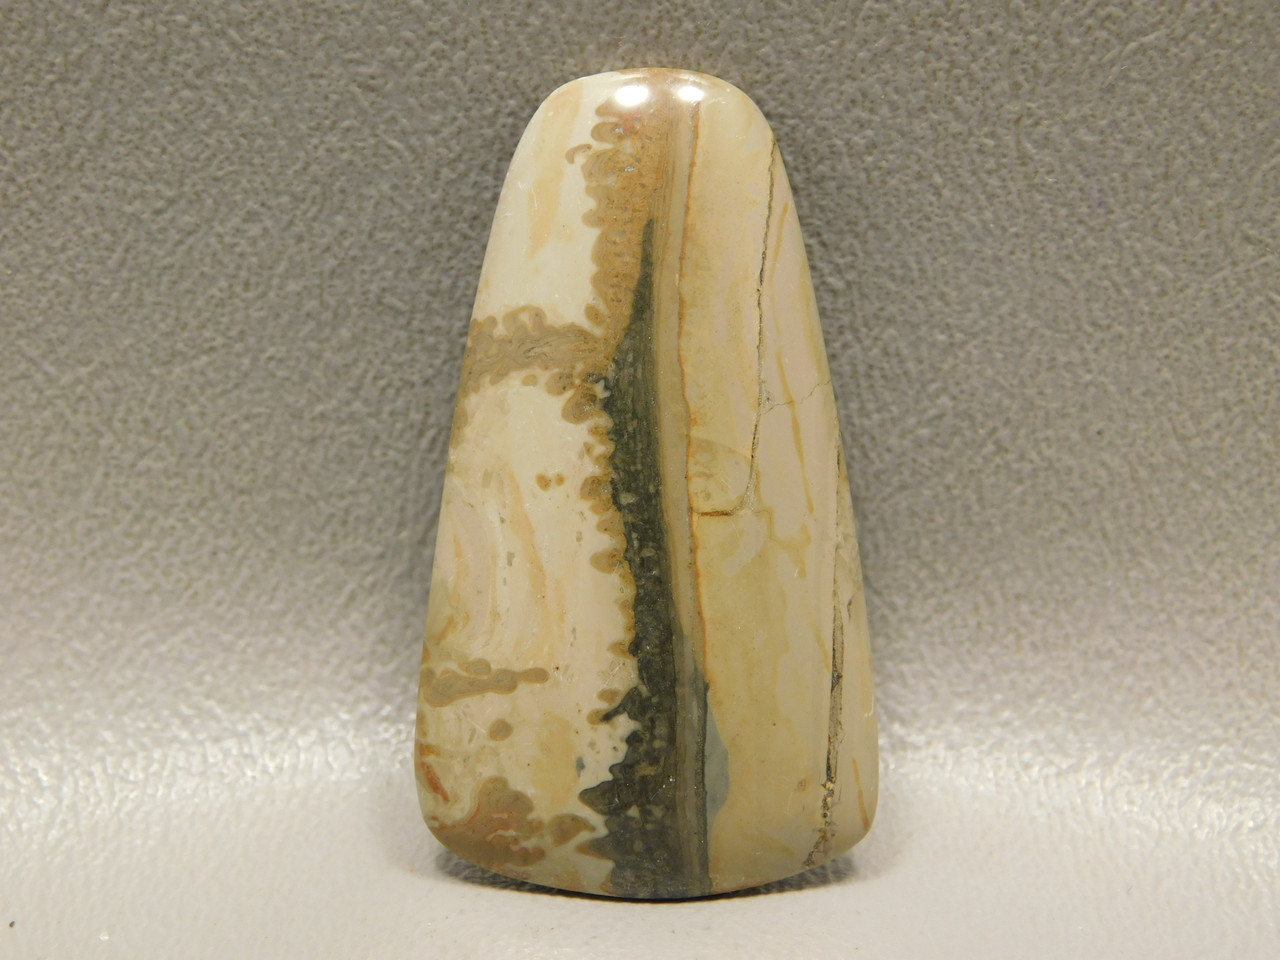 Cotham Marble Fossil Stone Cabochon Stromatolite Gemstone #7